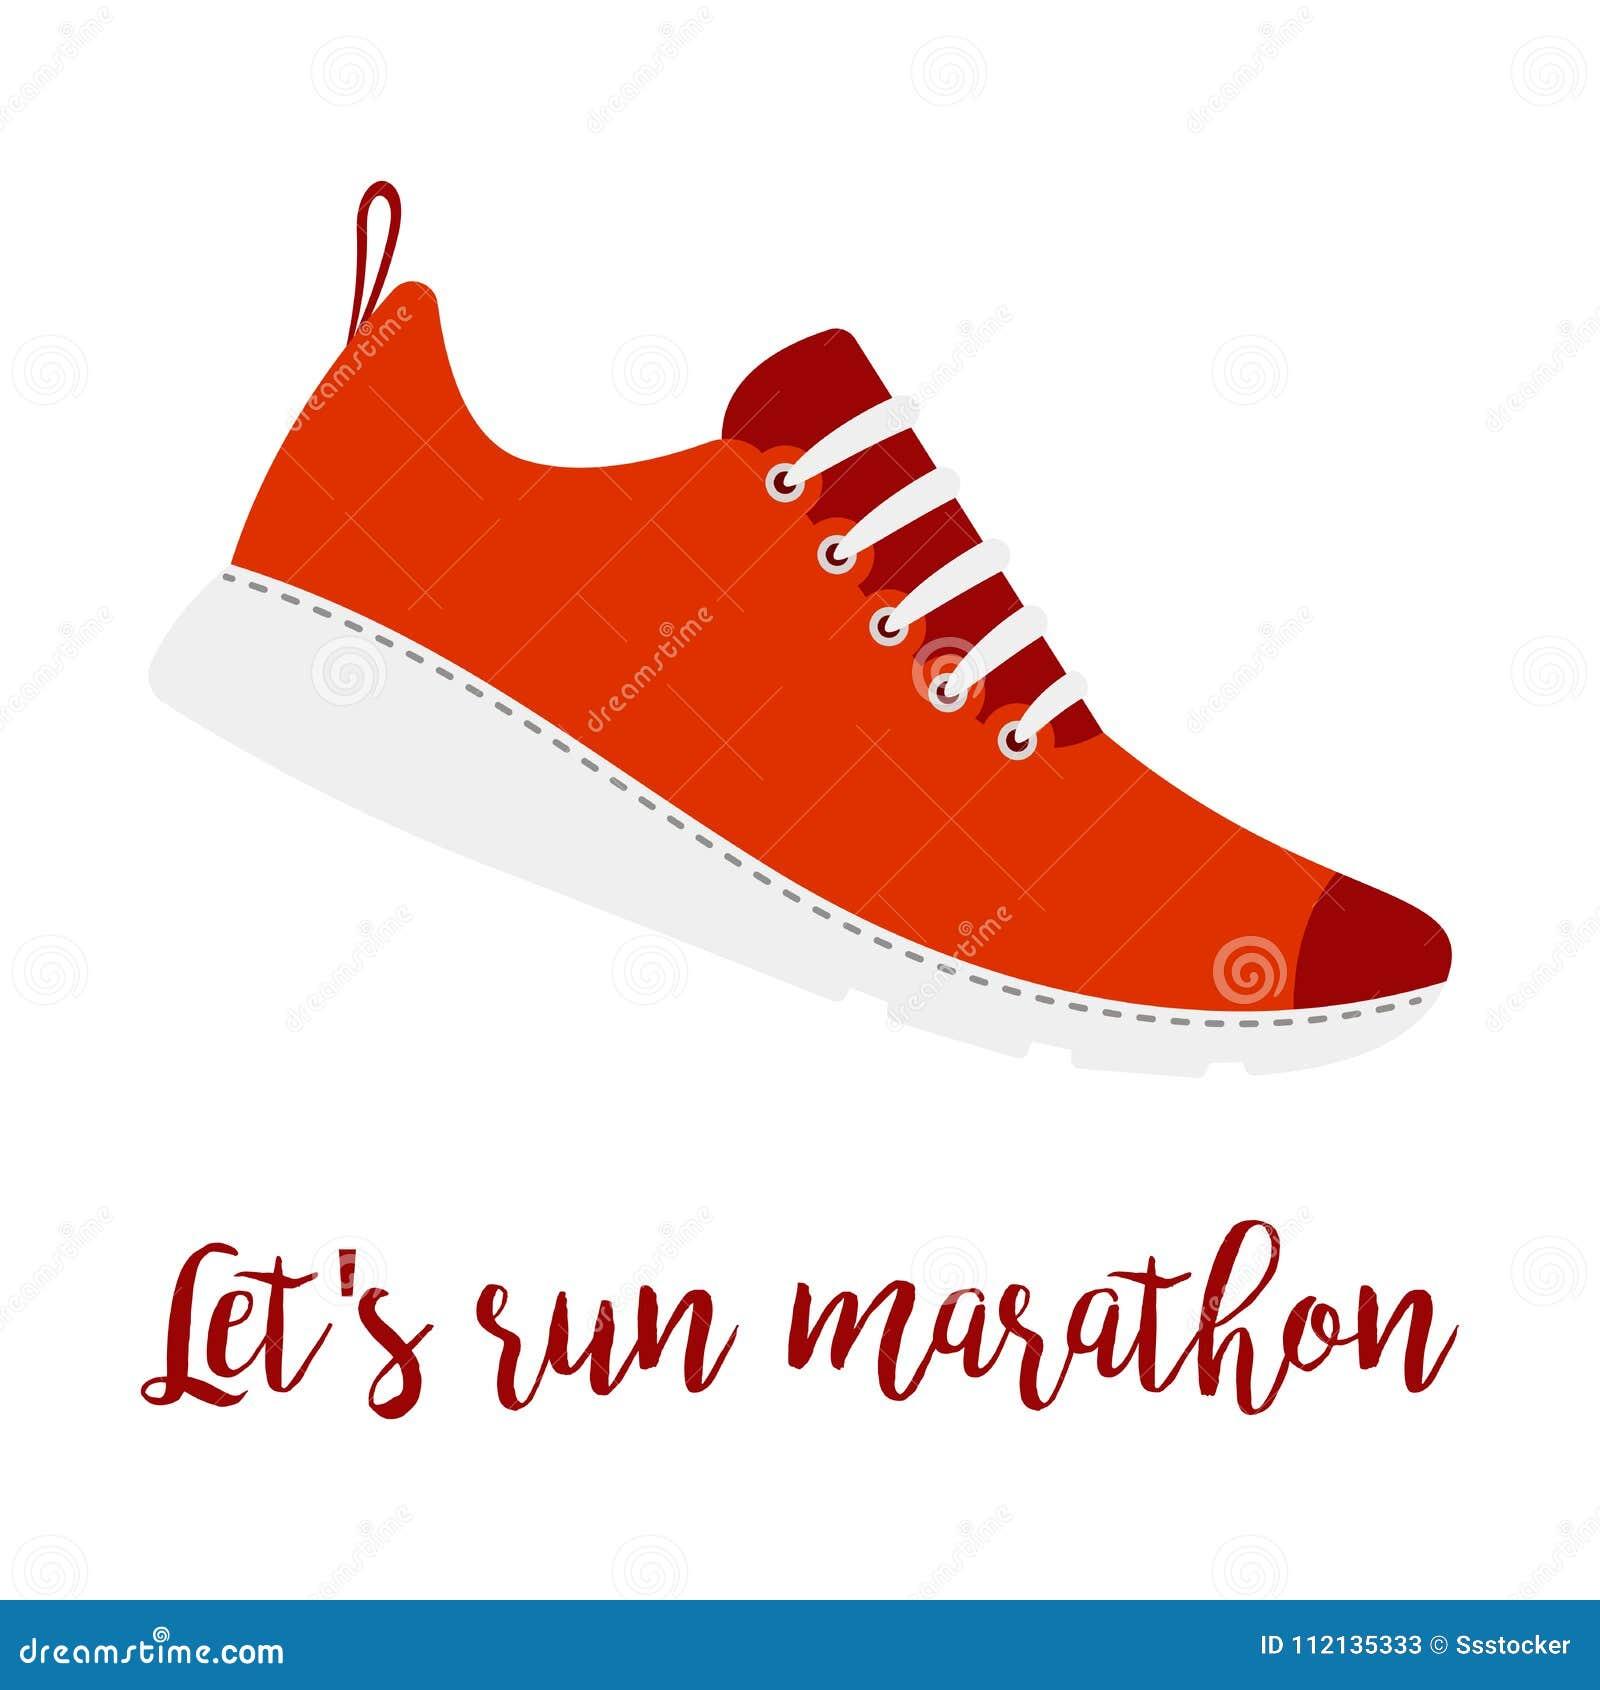 7cf836f119d7 Lets Run Marathon Style Shoe Stock Vector - Illustration of legs ...